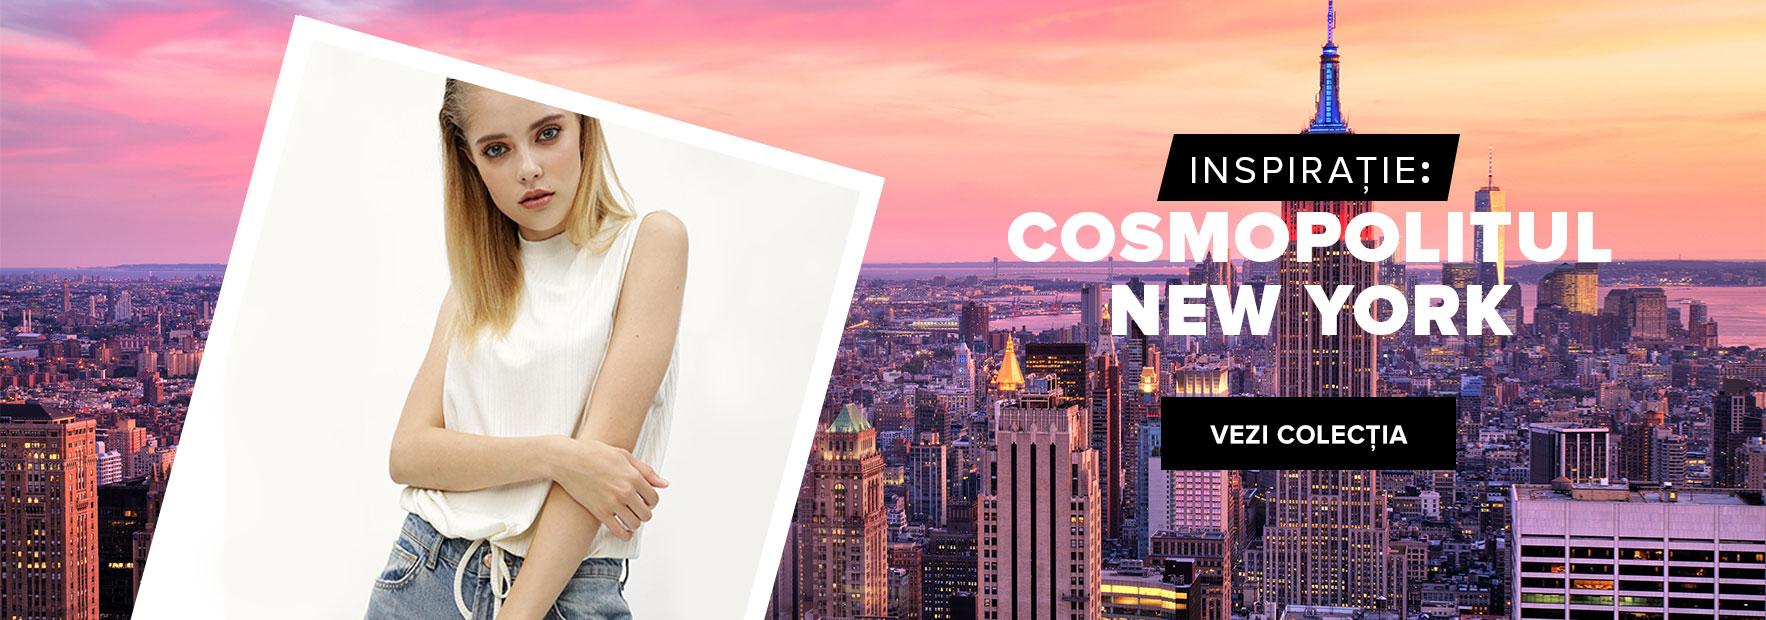 inspiratie-cosmopolitul-new-york